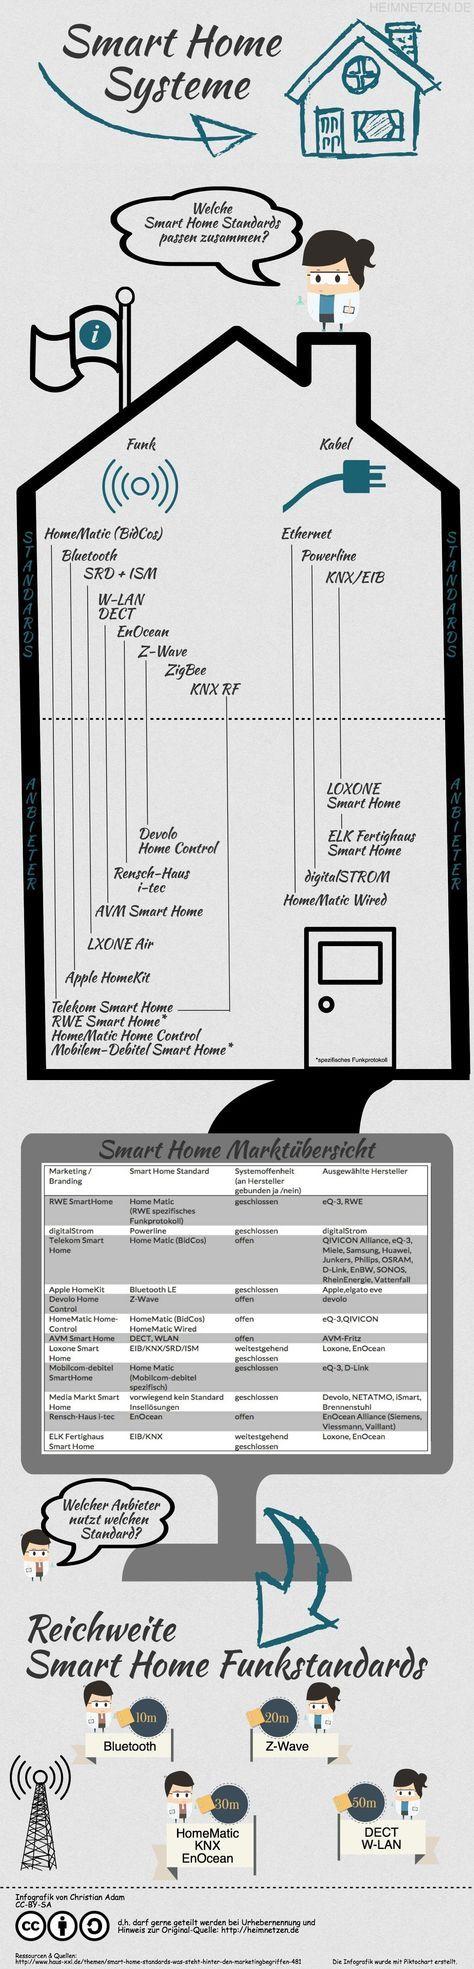 Smarthouse Kosten infografik smarthome systeme im überblick home automatisierung